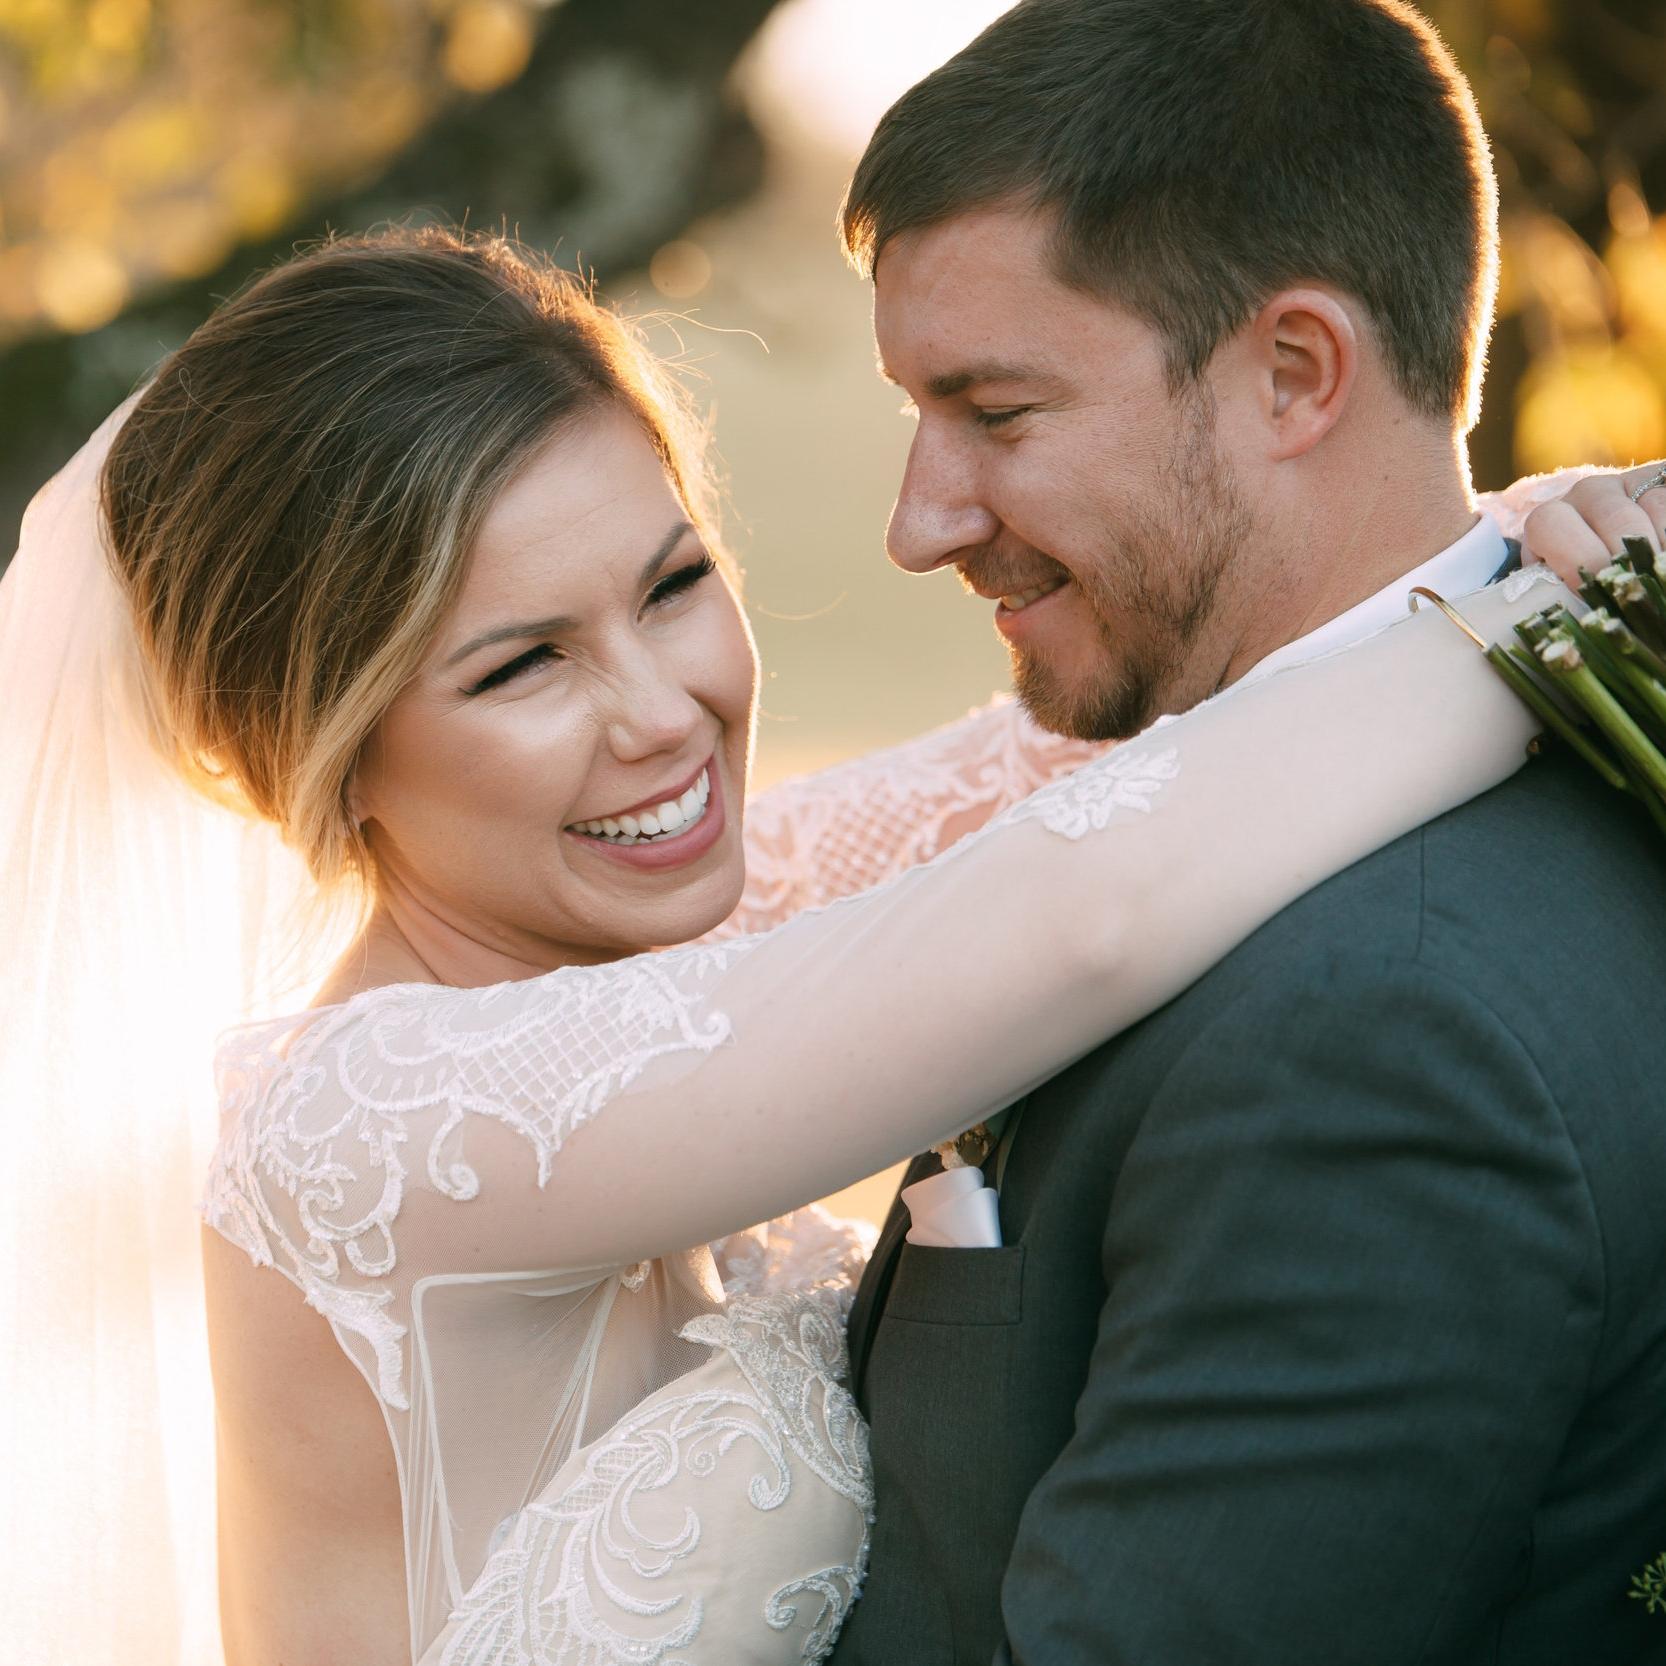 Kristina & Jacob - November 12, 2016